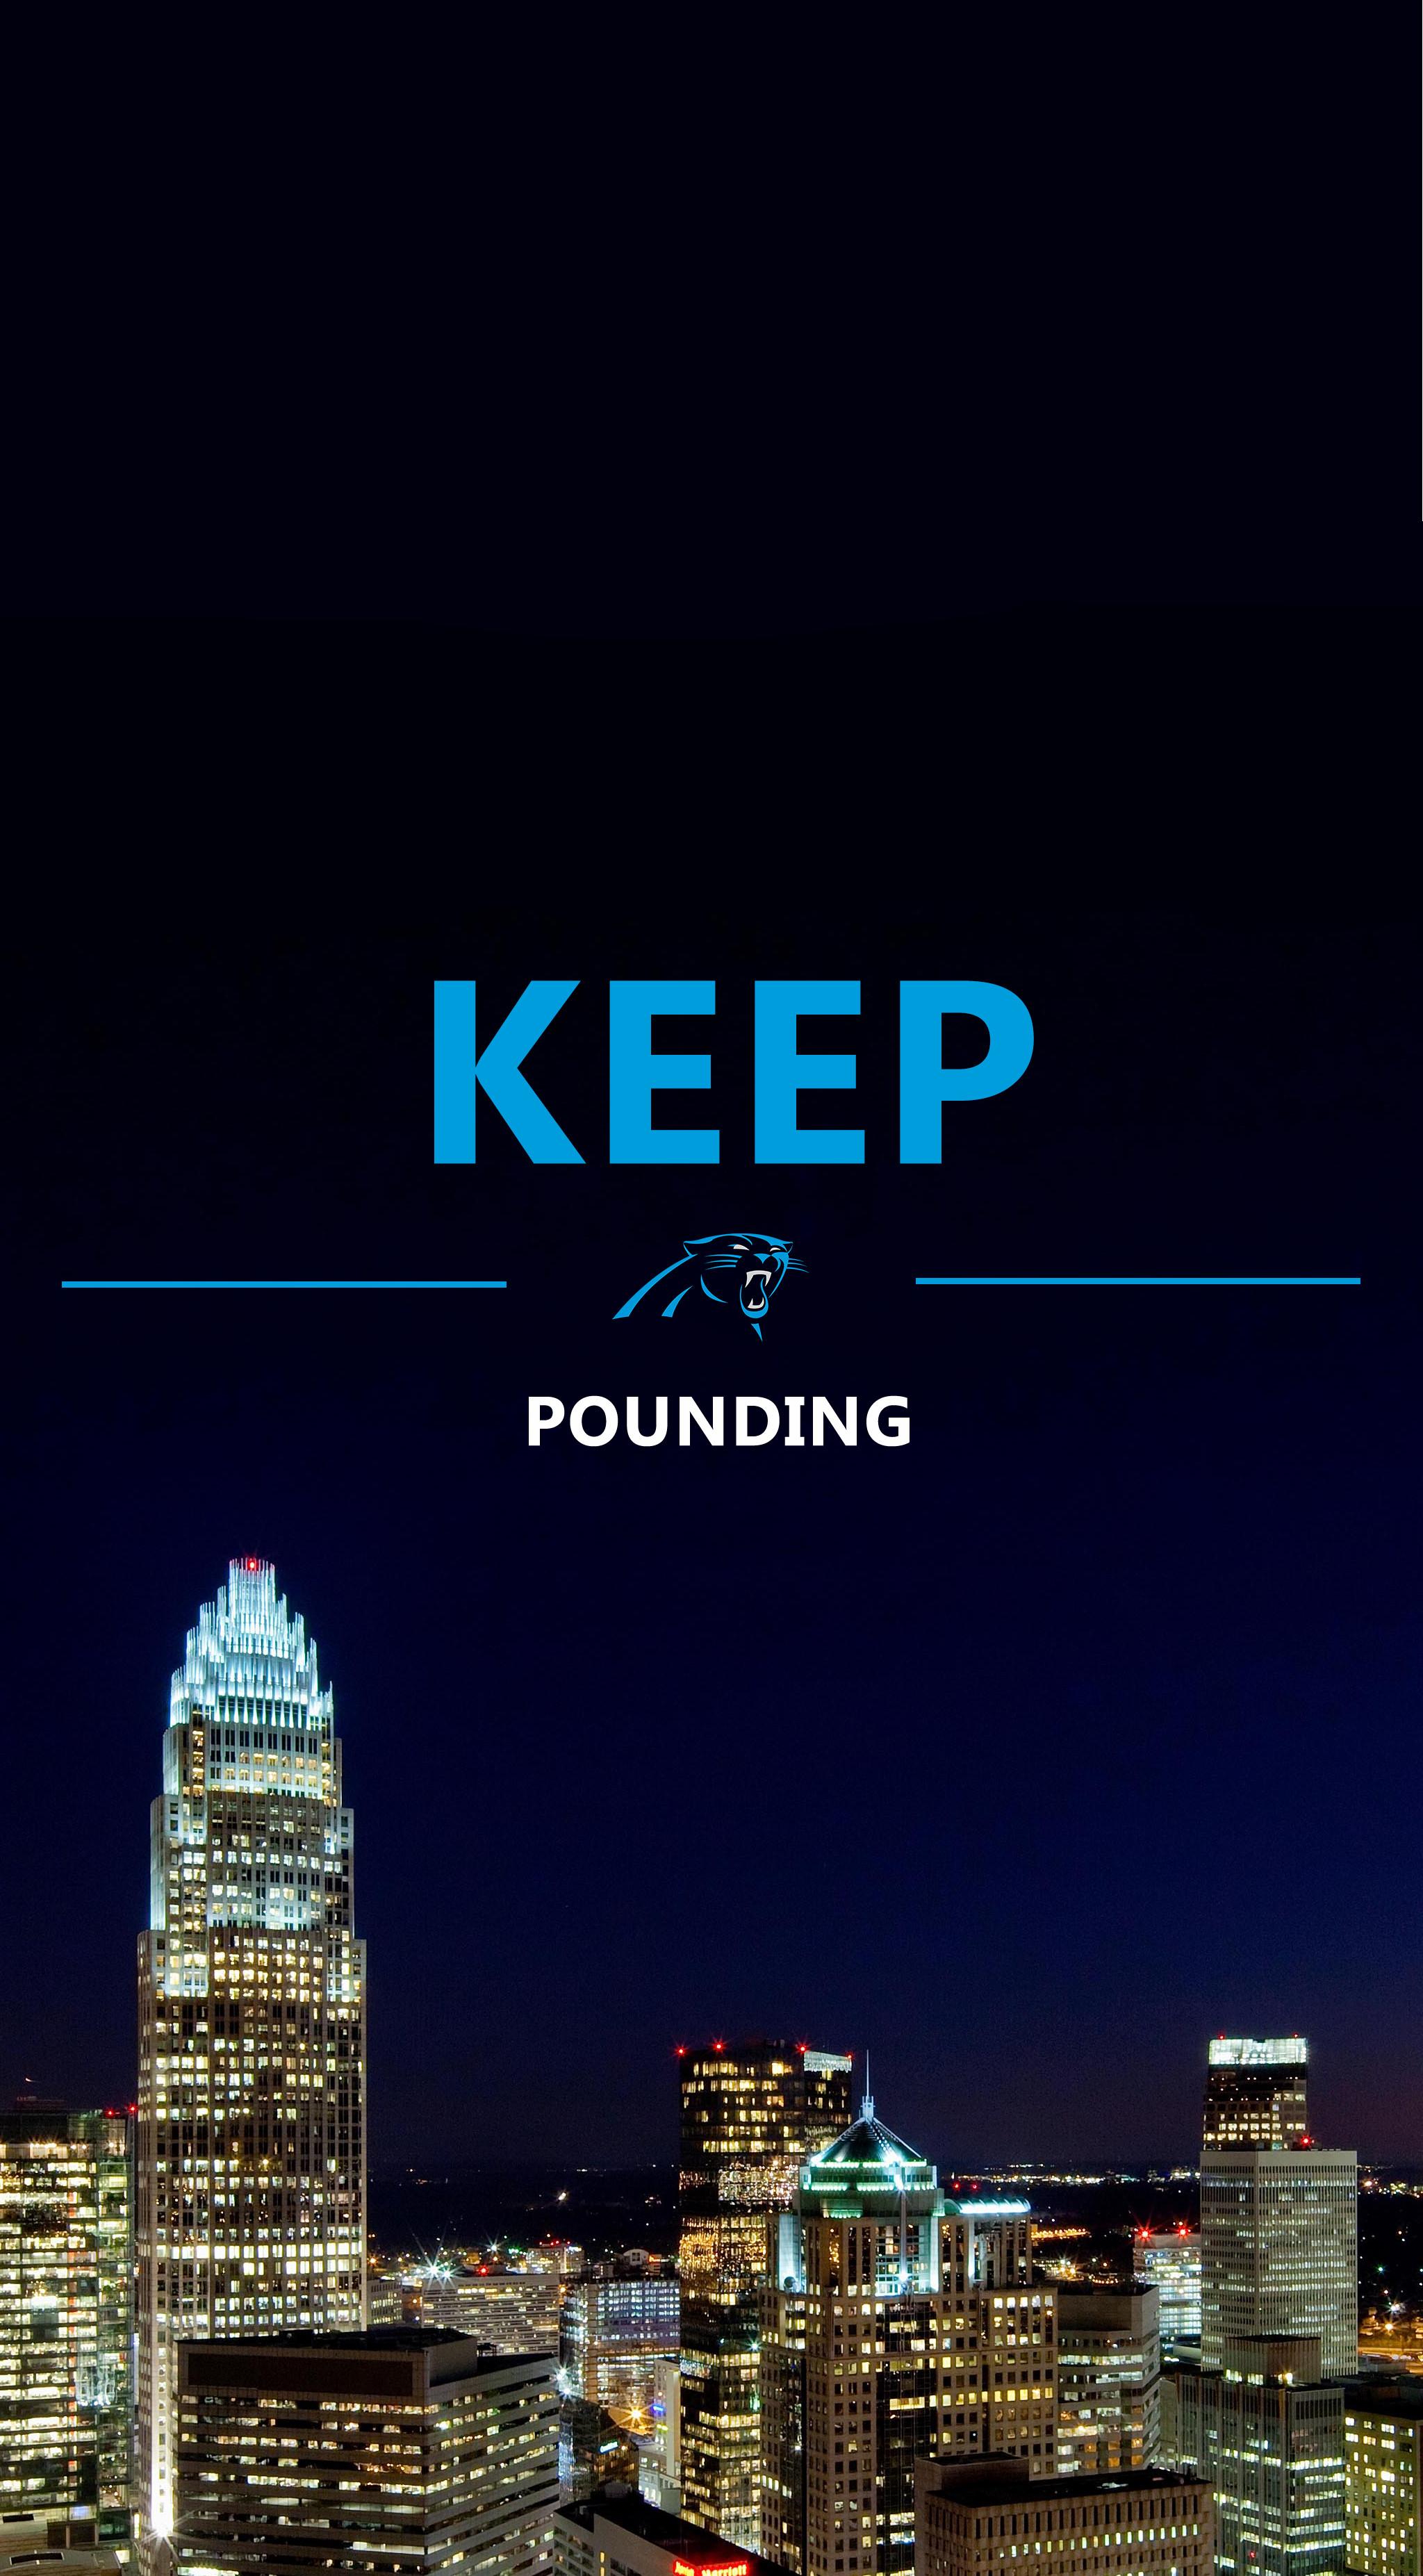 Carolina Panthers Phone Wallpaper